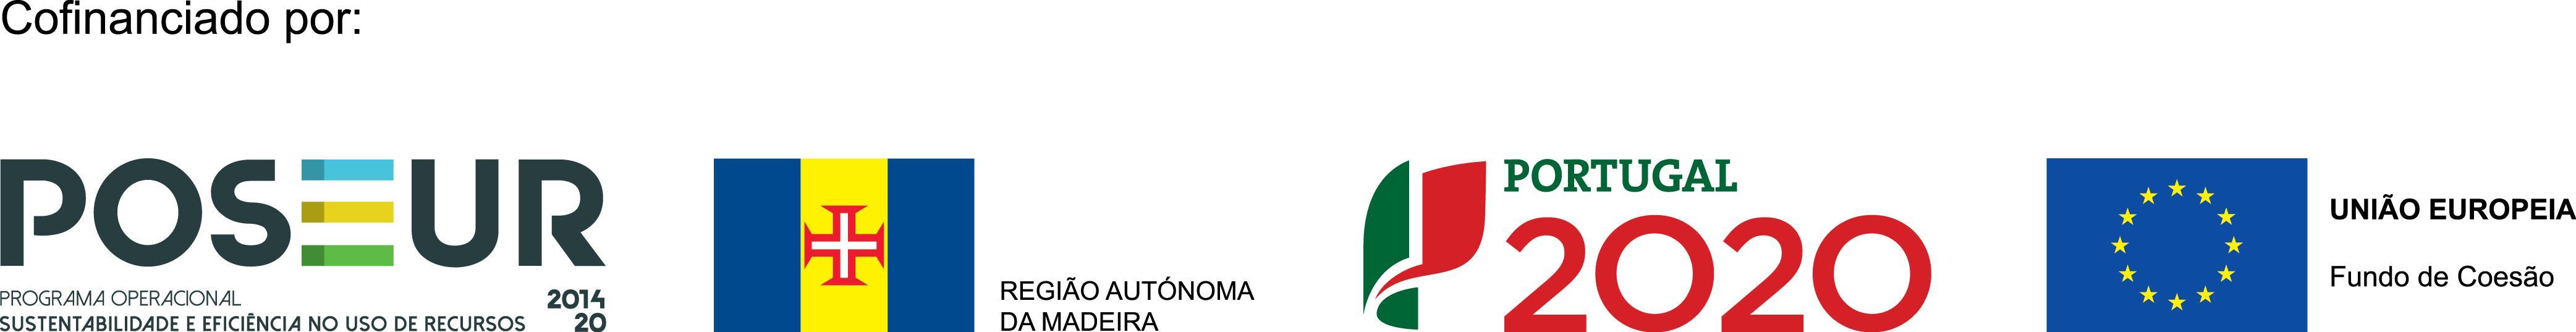 Logotipos POSEUR